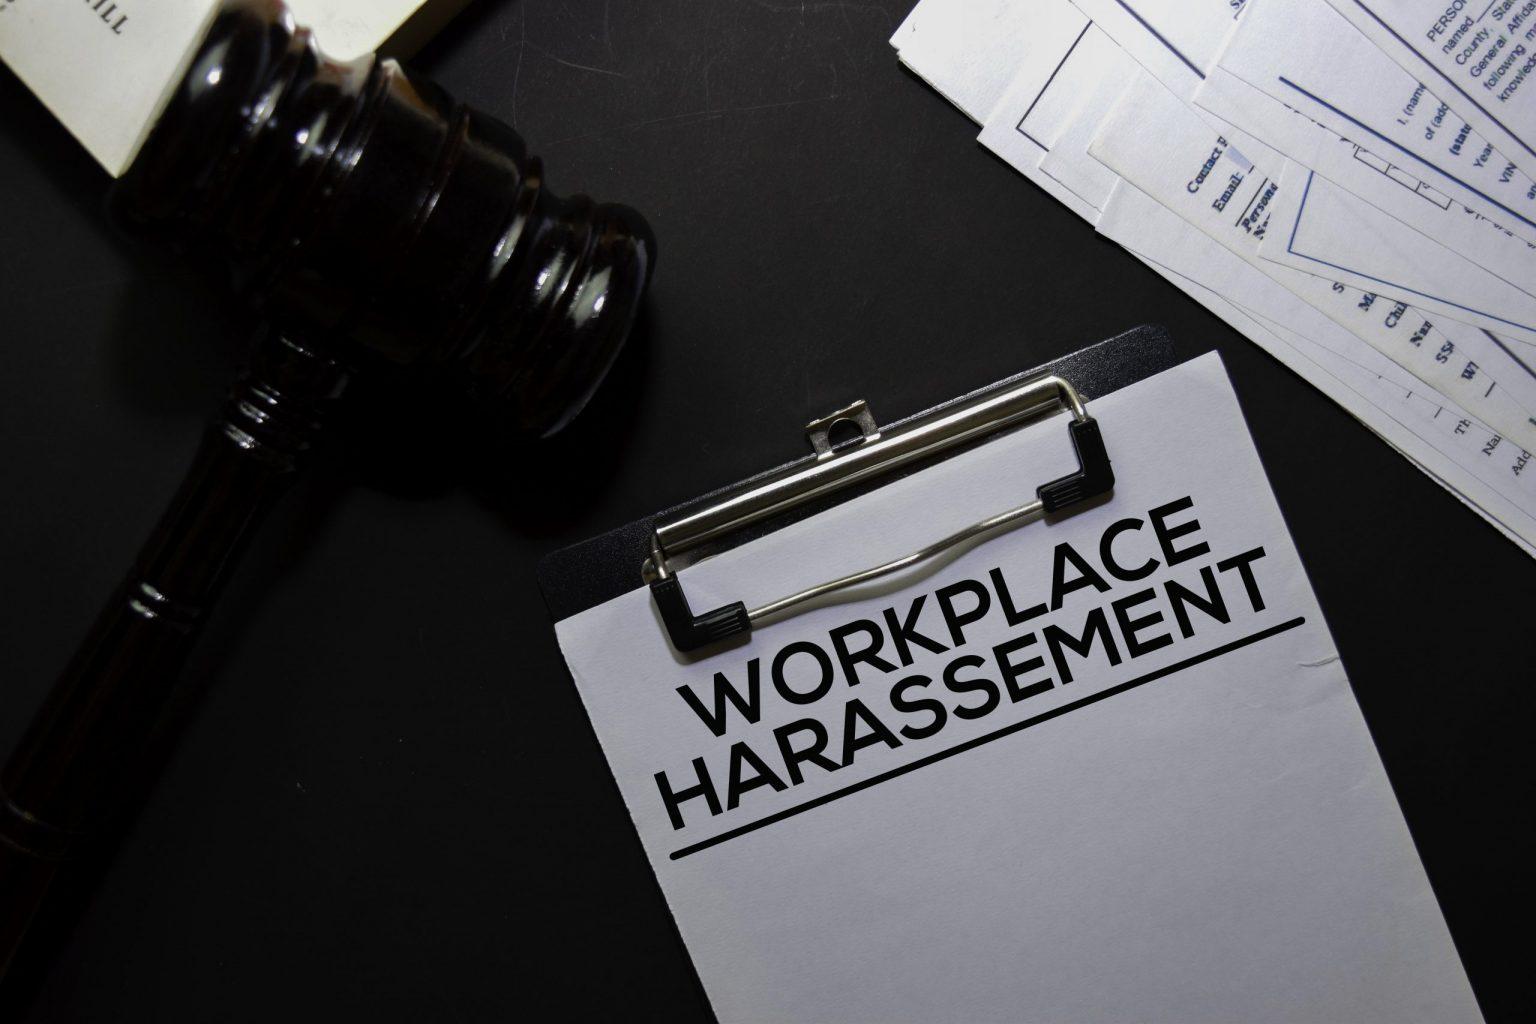 workplace harrassement discrimination andbullting in calgary